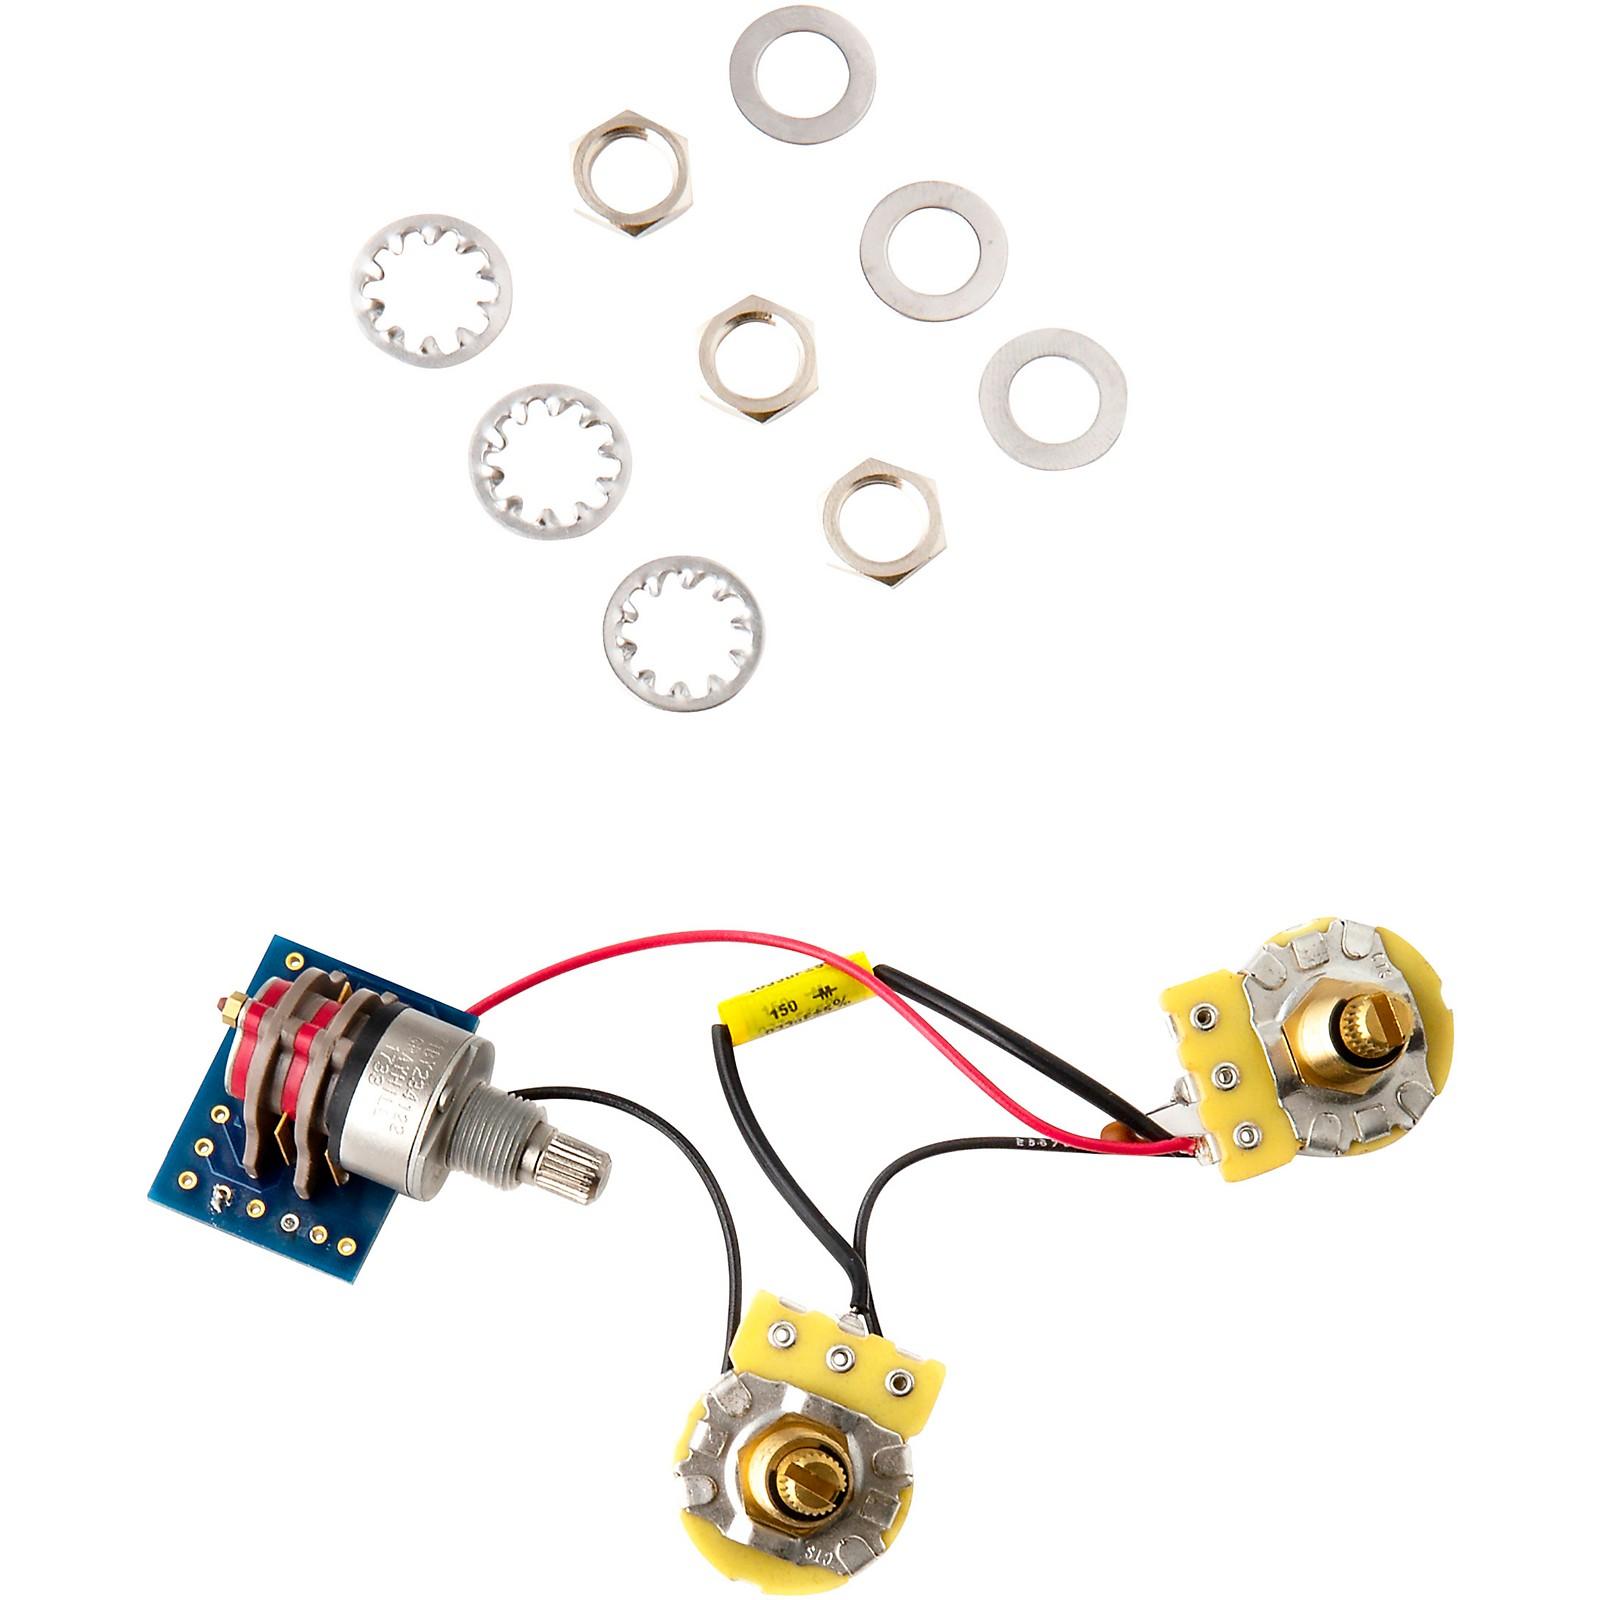 PRS Custom 22/24 Drop In 5-Way Rotary, Volume & Tone